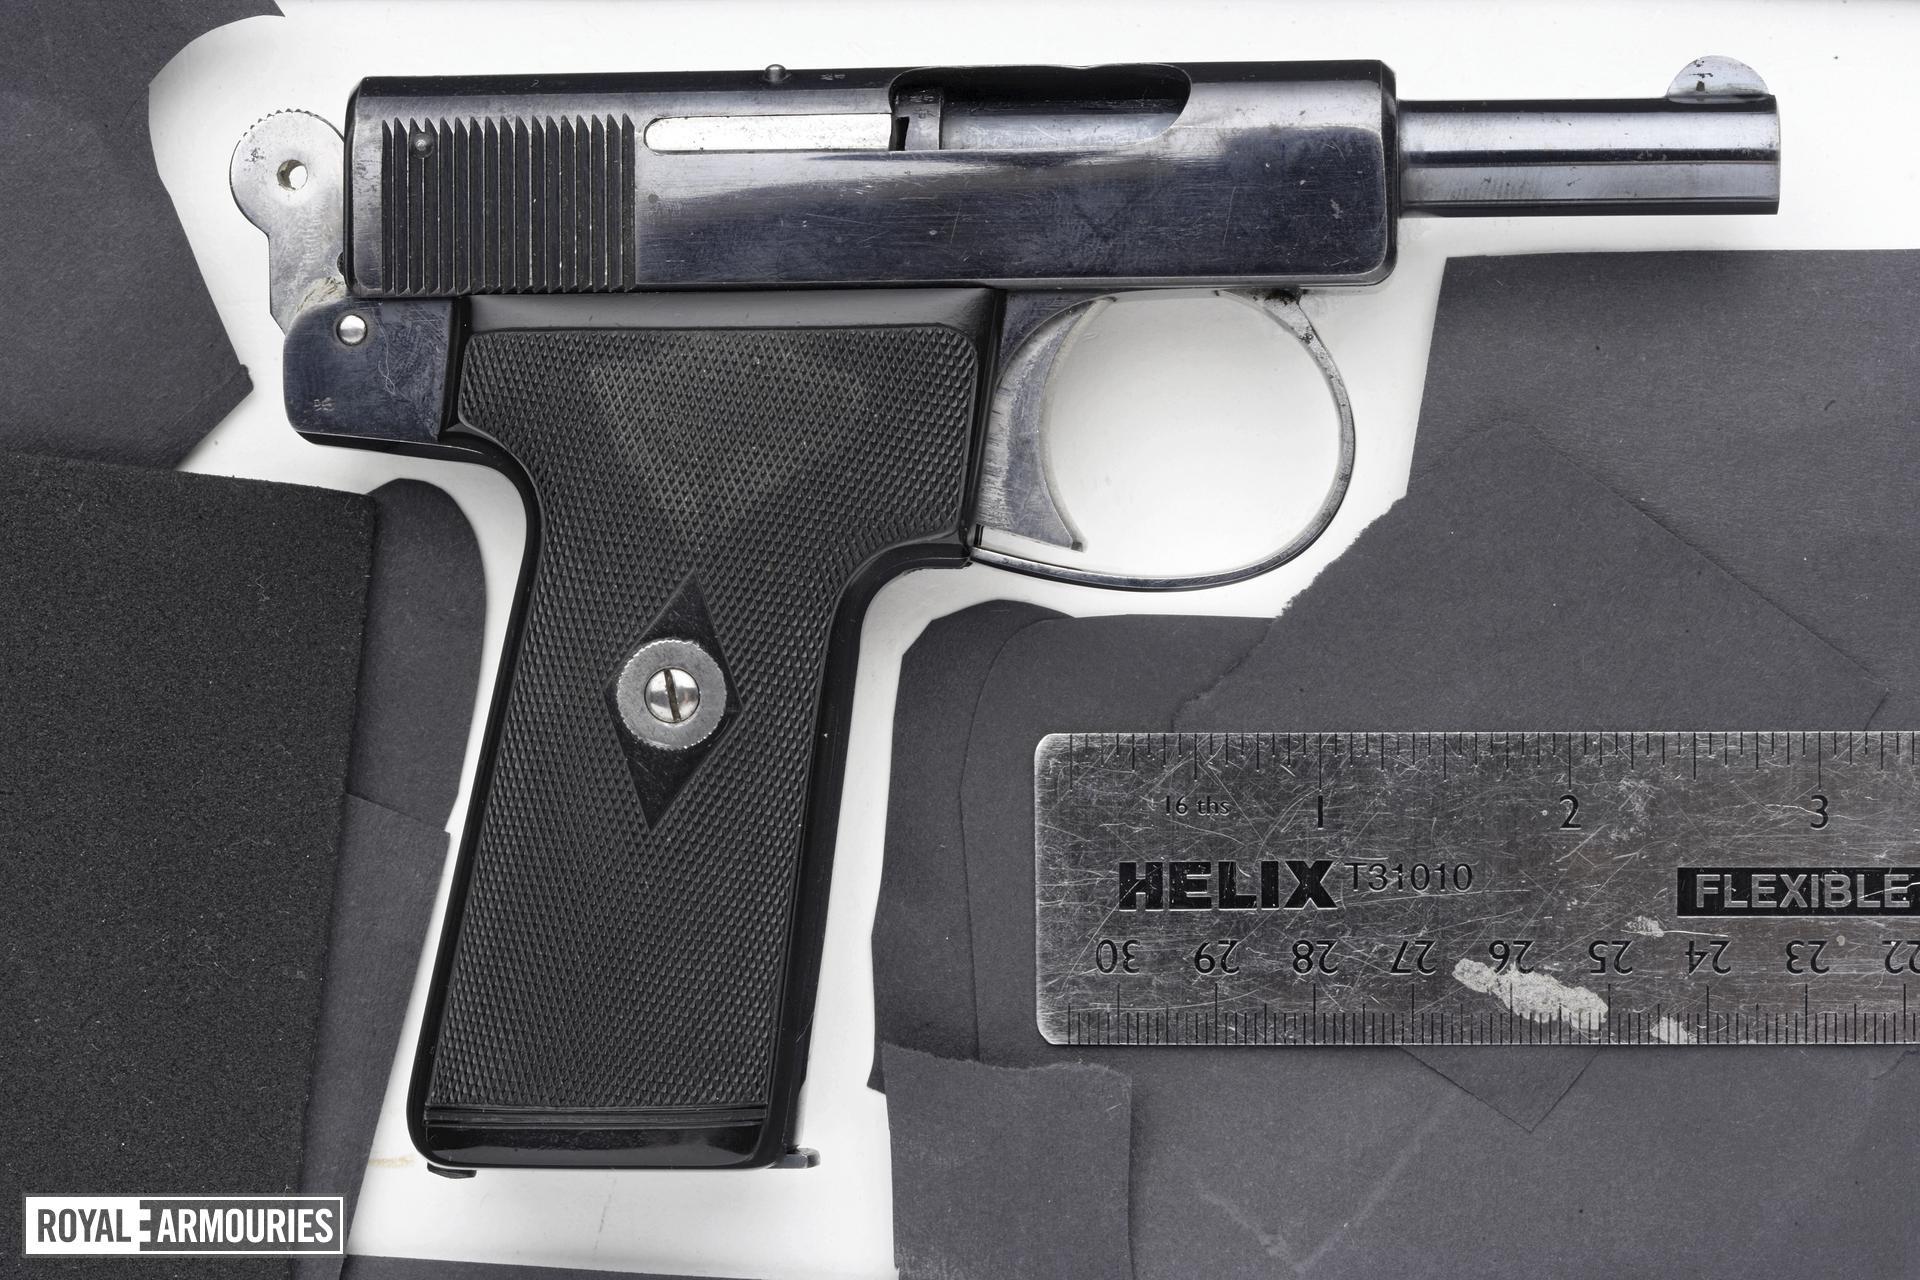 Centrefire self-loading pistol - Webley Pocket Model 1910